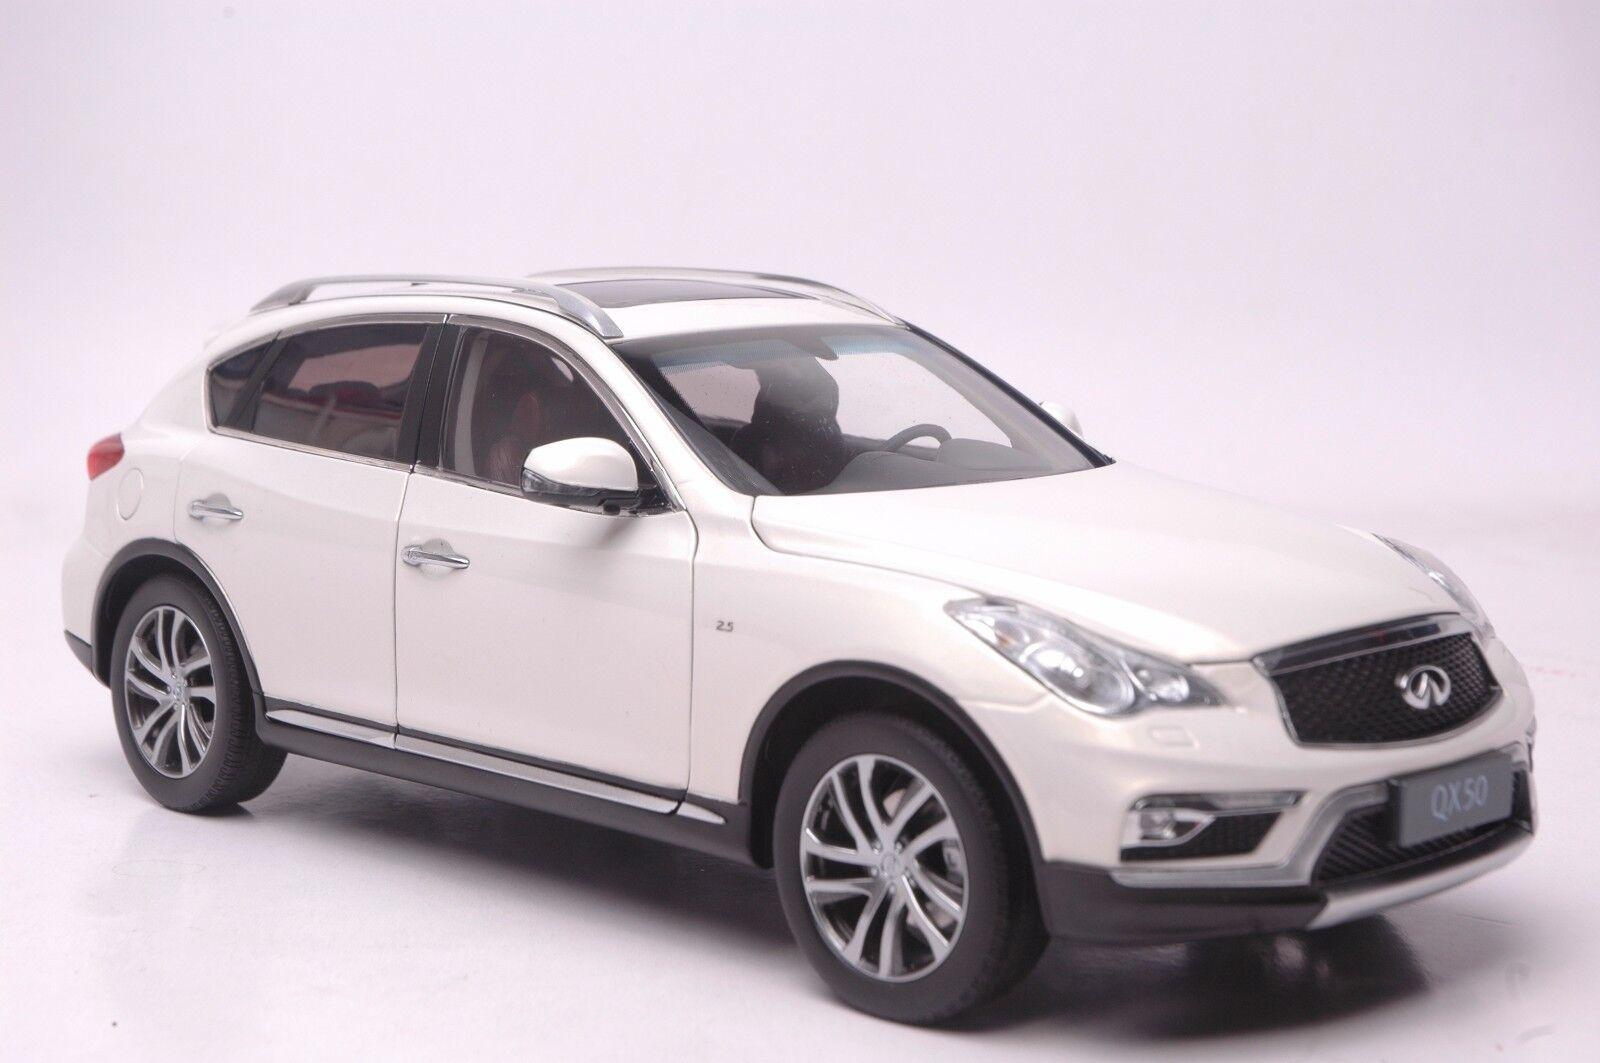 Infiniti QX50 2016 Sport Utility Vehicle modelo en escala 1 18 blancoo